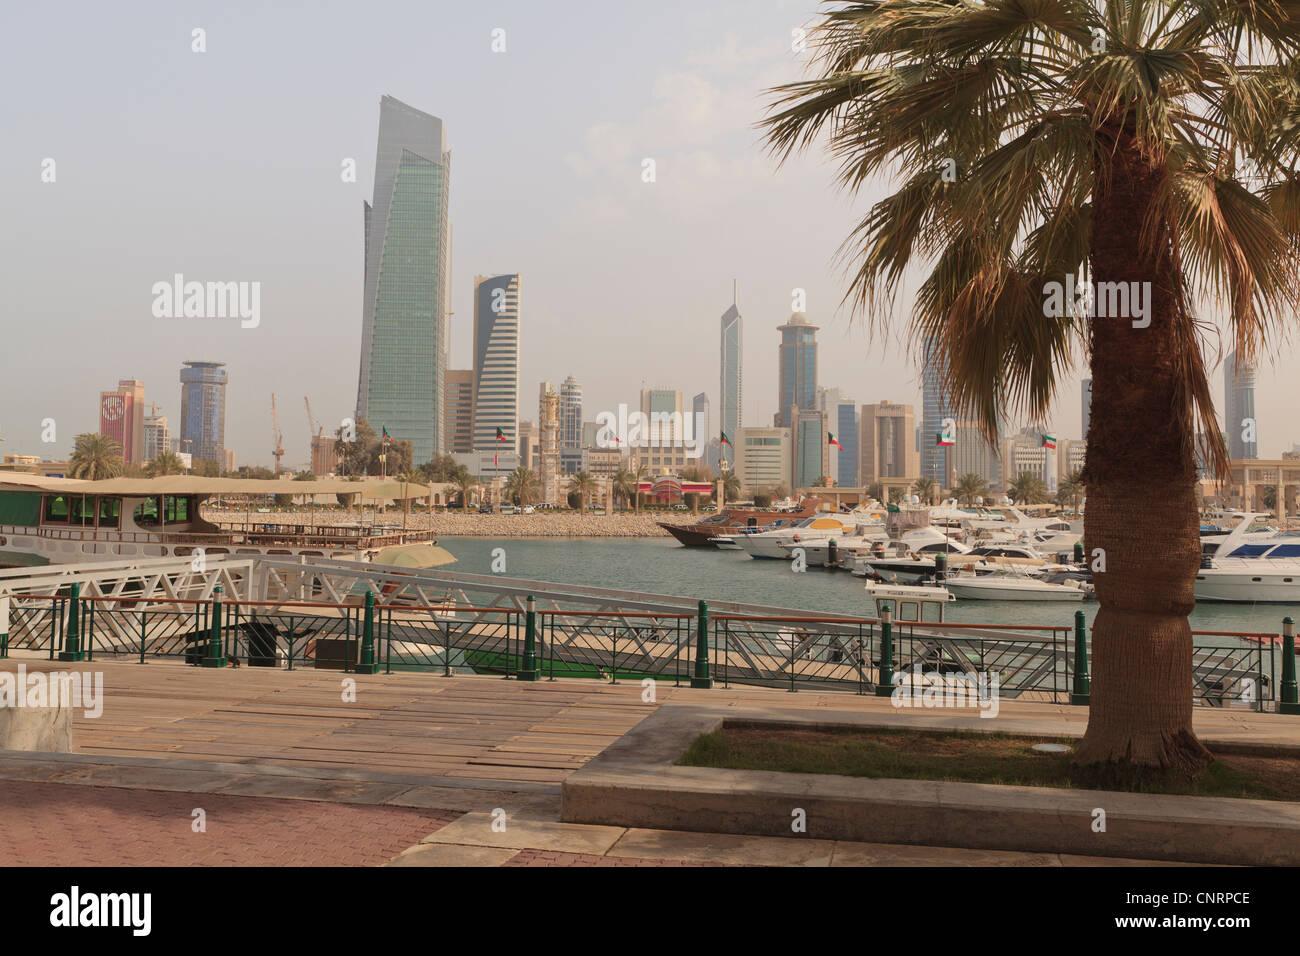 View of Kuwait City skyline across Souq Sharq Marina - Stock Image